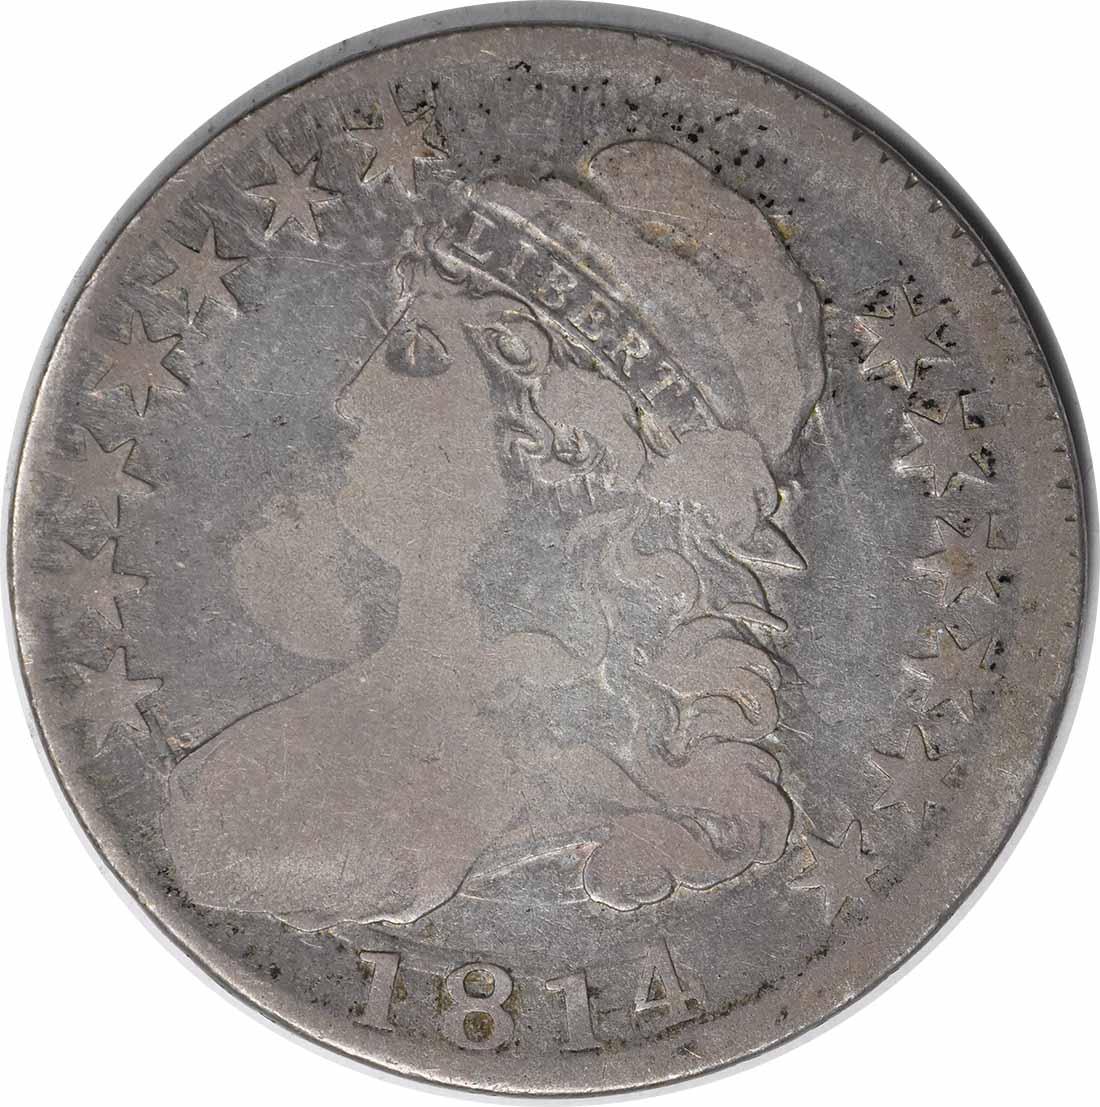 1814/3 Bust Half Dollar E/A O-108 VG Uncertified